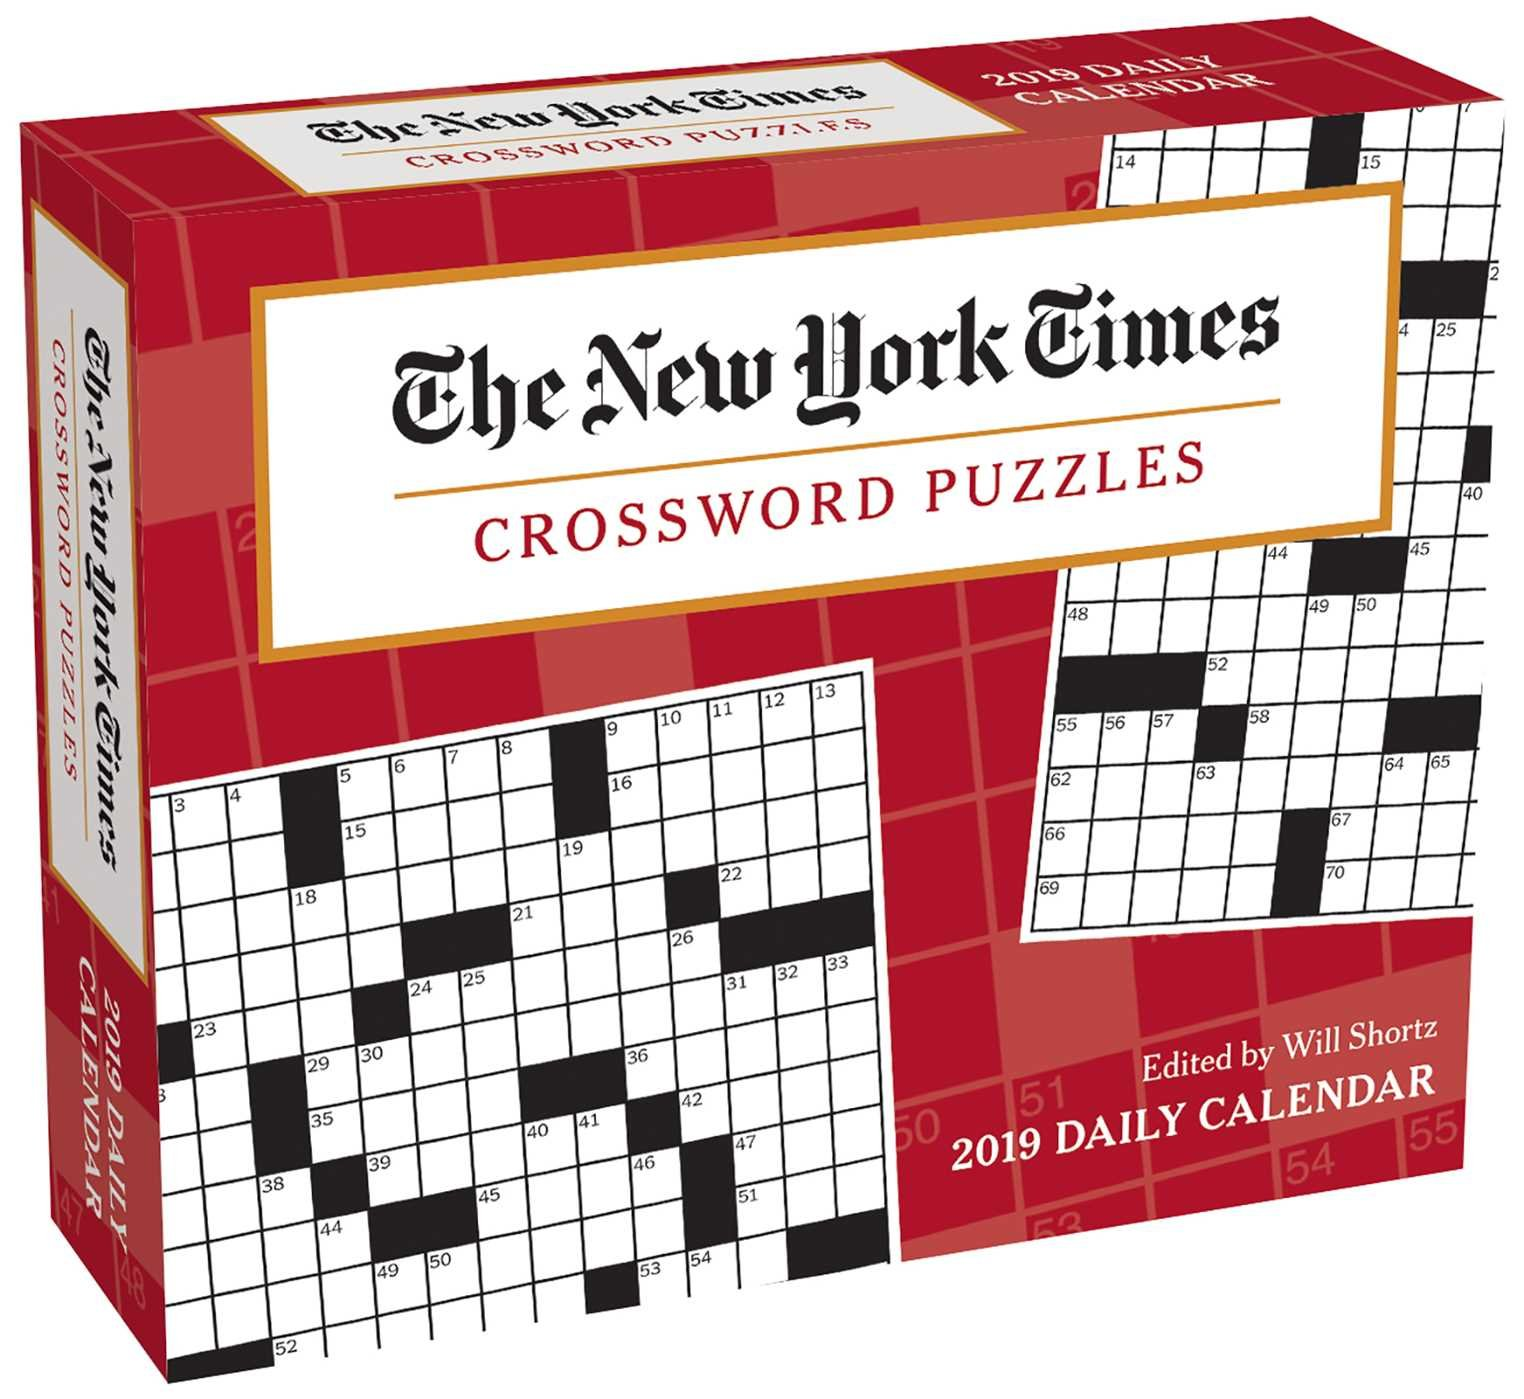 Buy Daily Crossword Now!